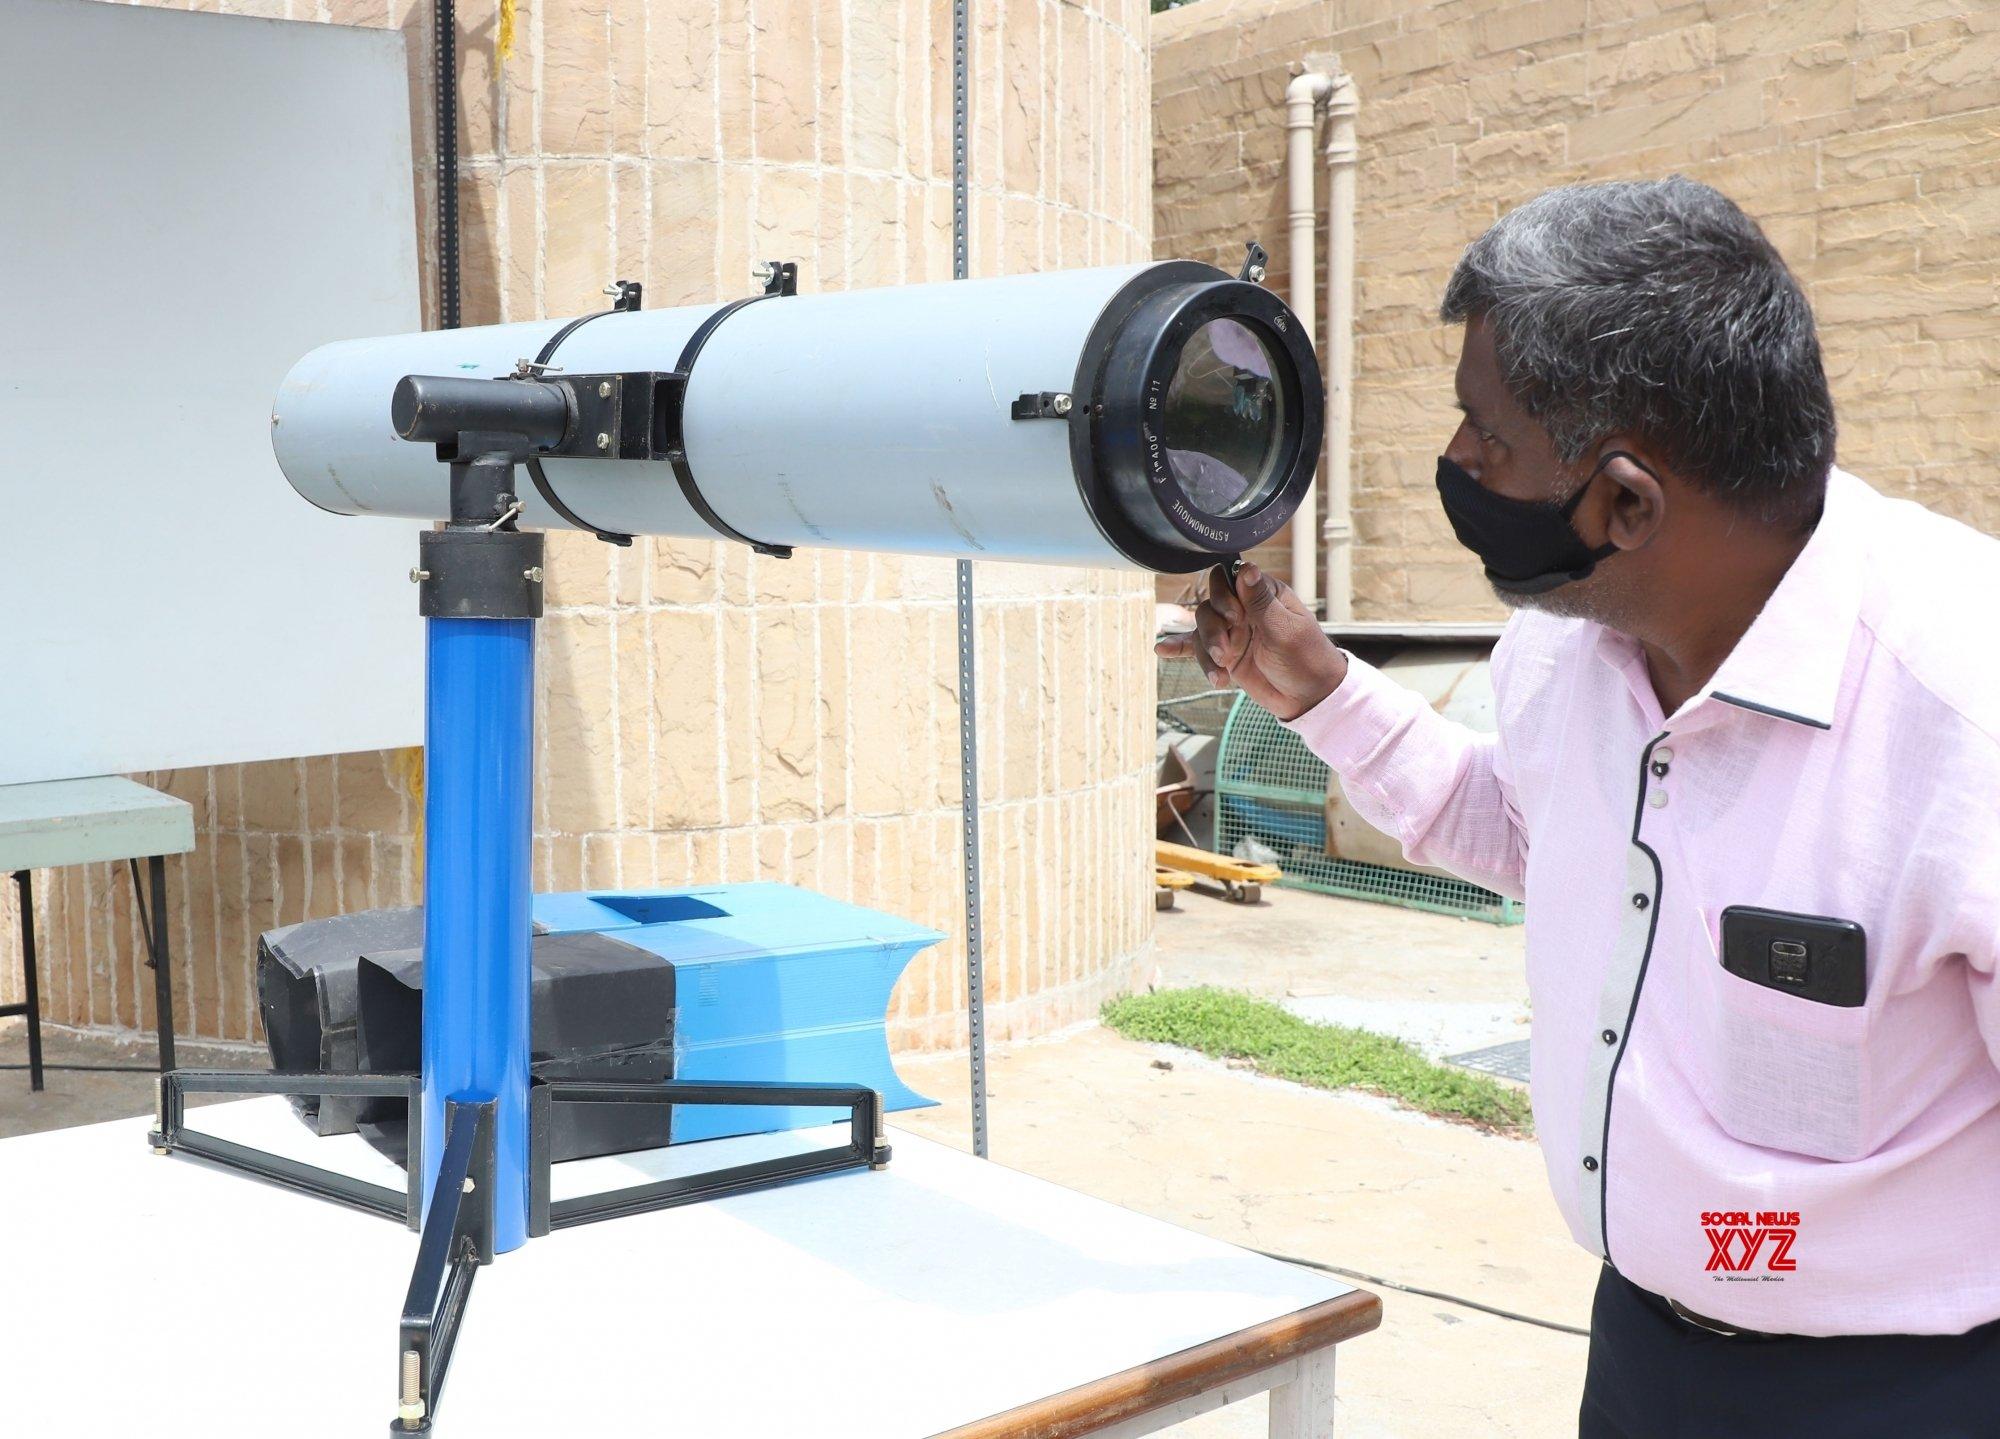 Bengaluru: Preparations underway at Nehru Planetarium to observe tomorrow's Solar Eclipse #Gallery